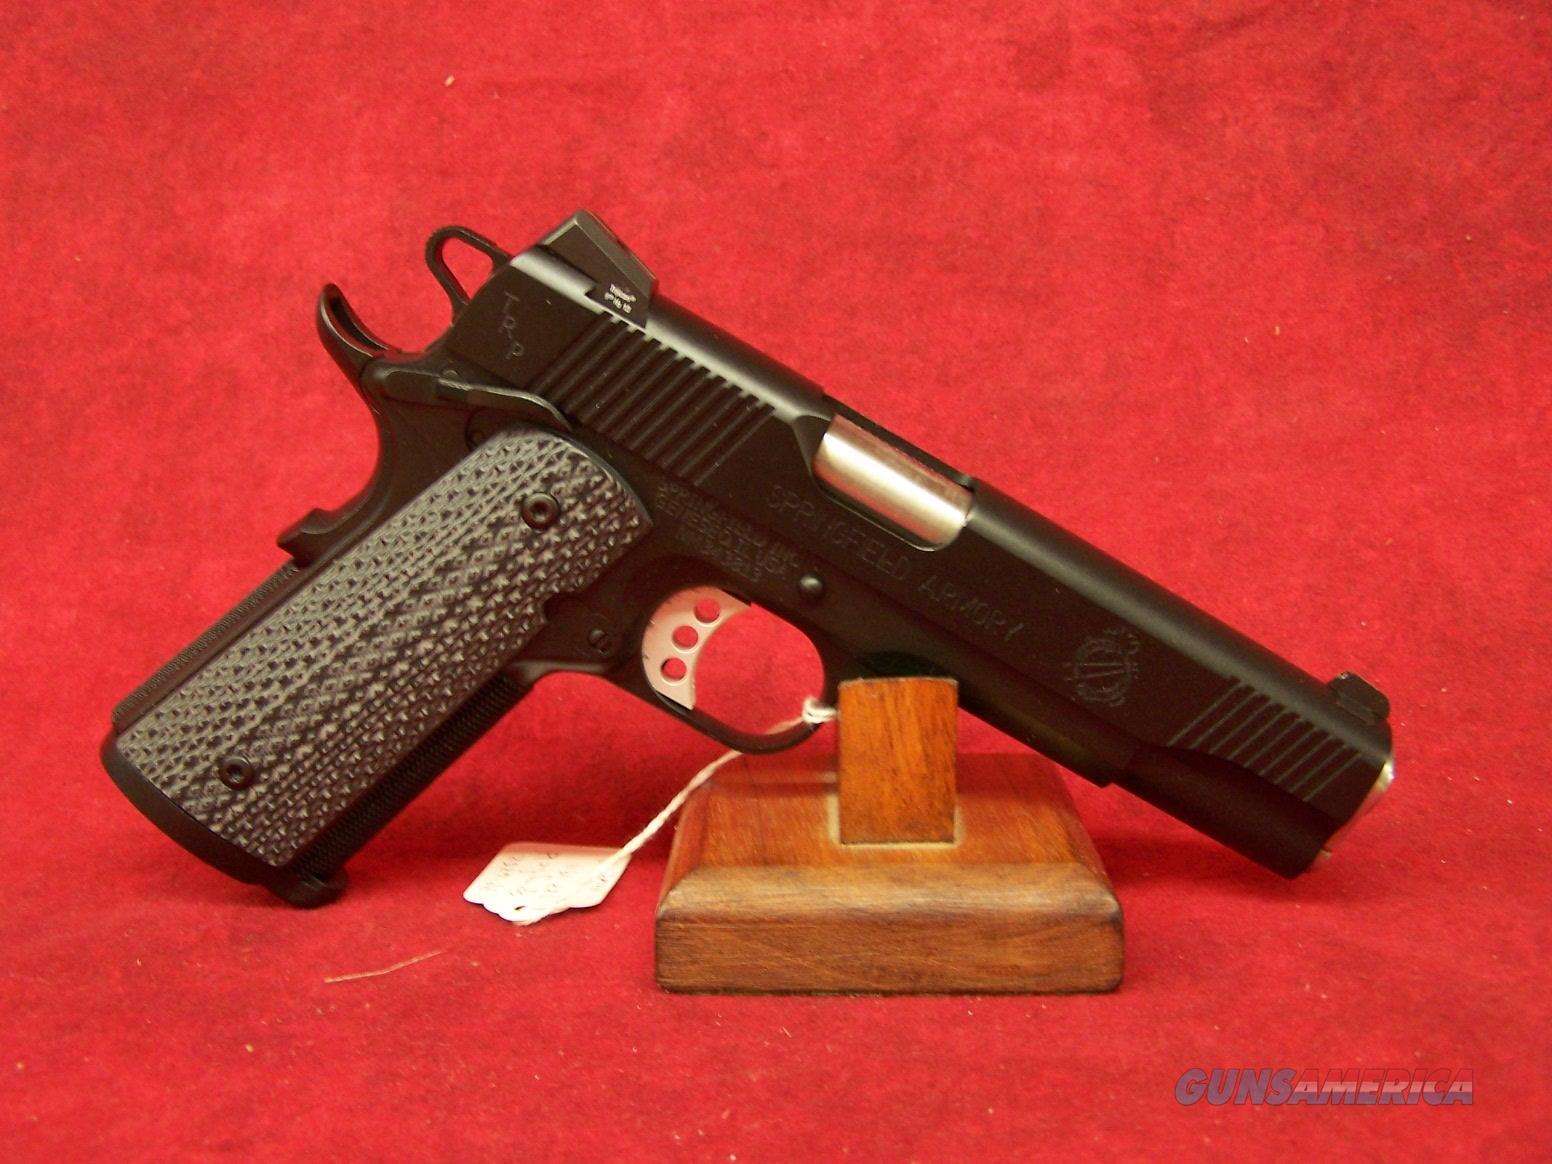 Springfield Armory 1911 TRP A-Kote .45ACP (PC9108LP)  Guns > Pistols > Springfield Armory Pistols > 1911 Type